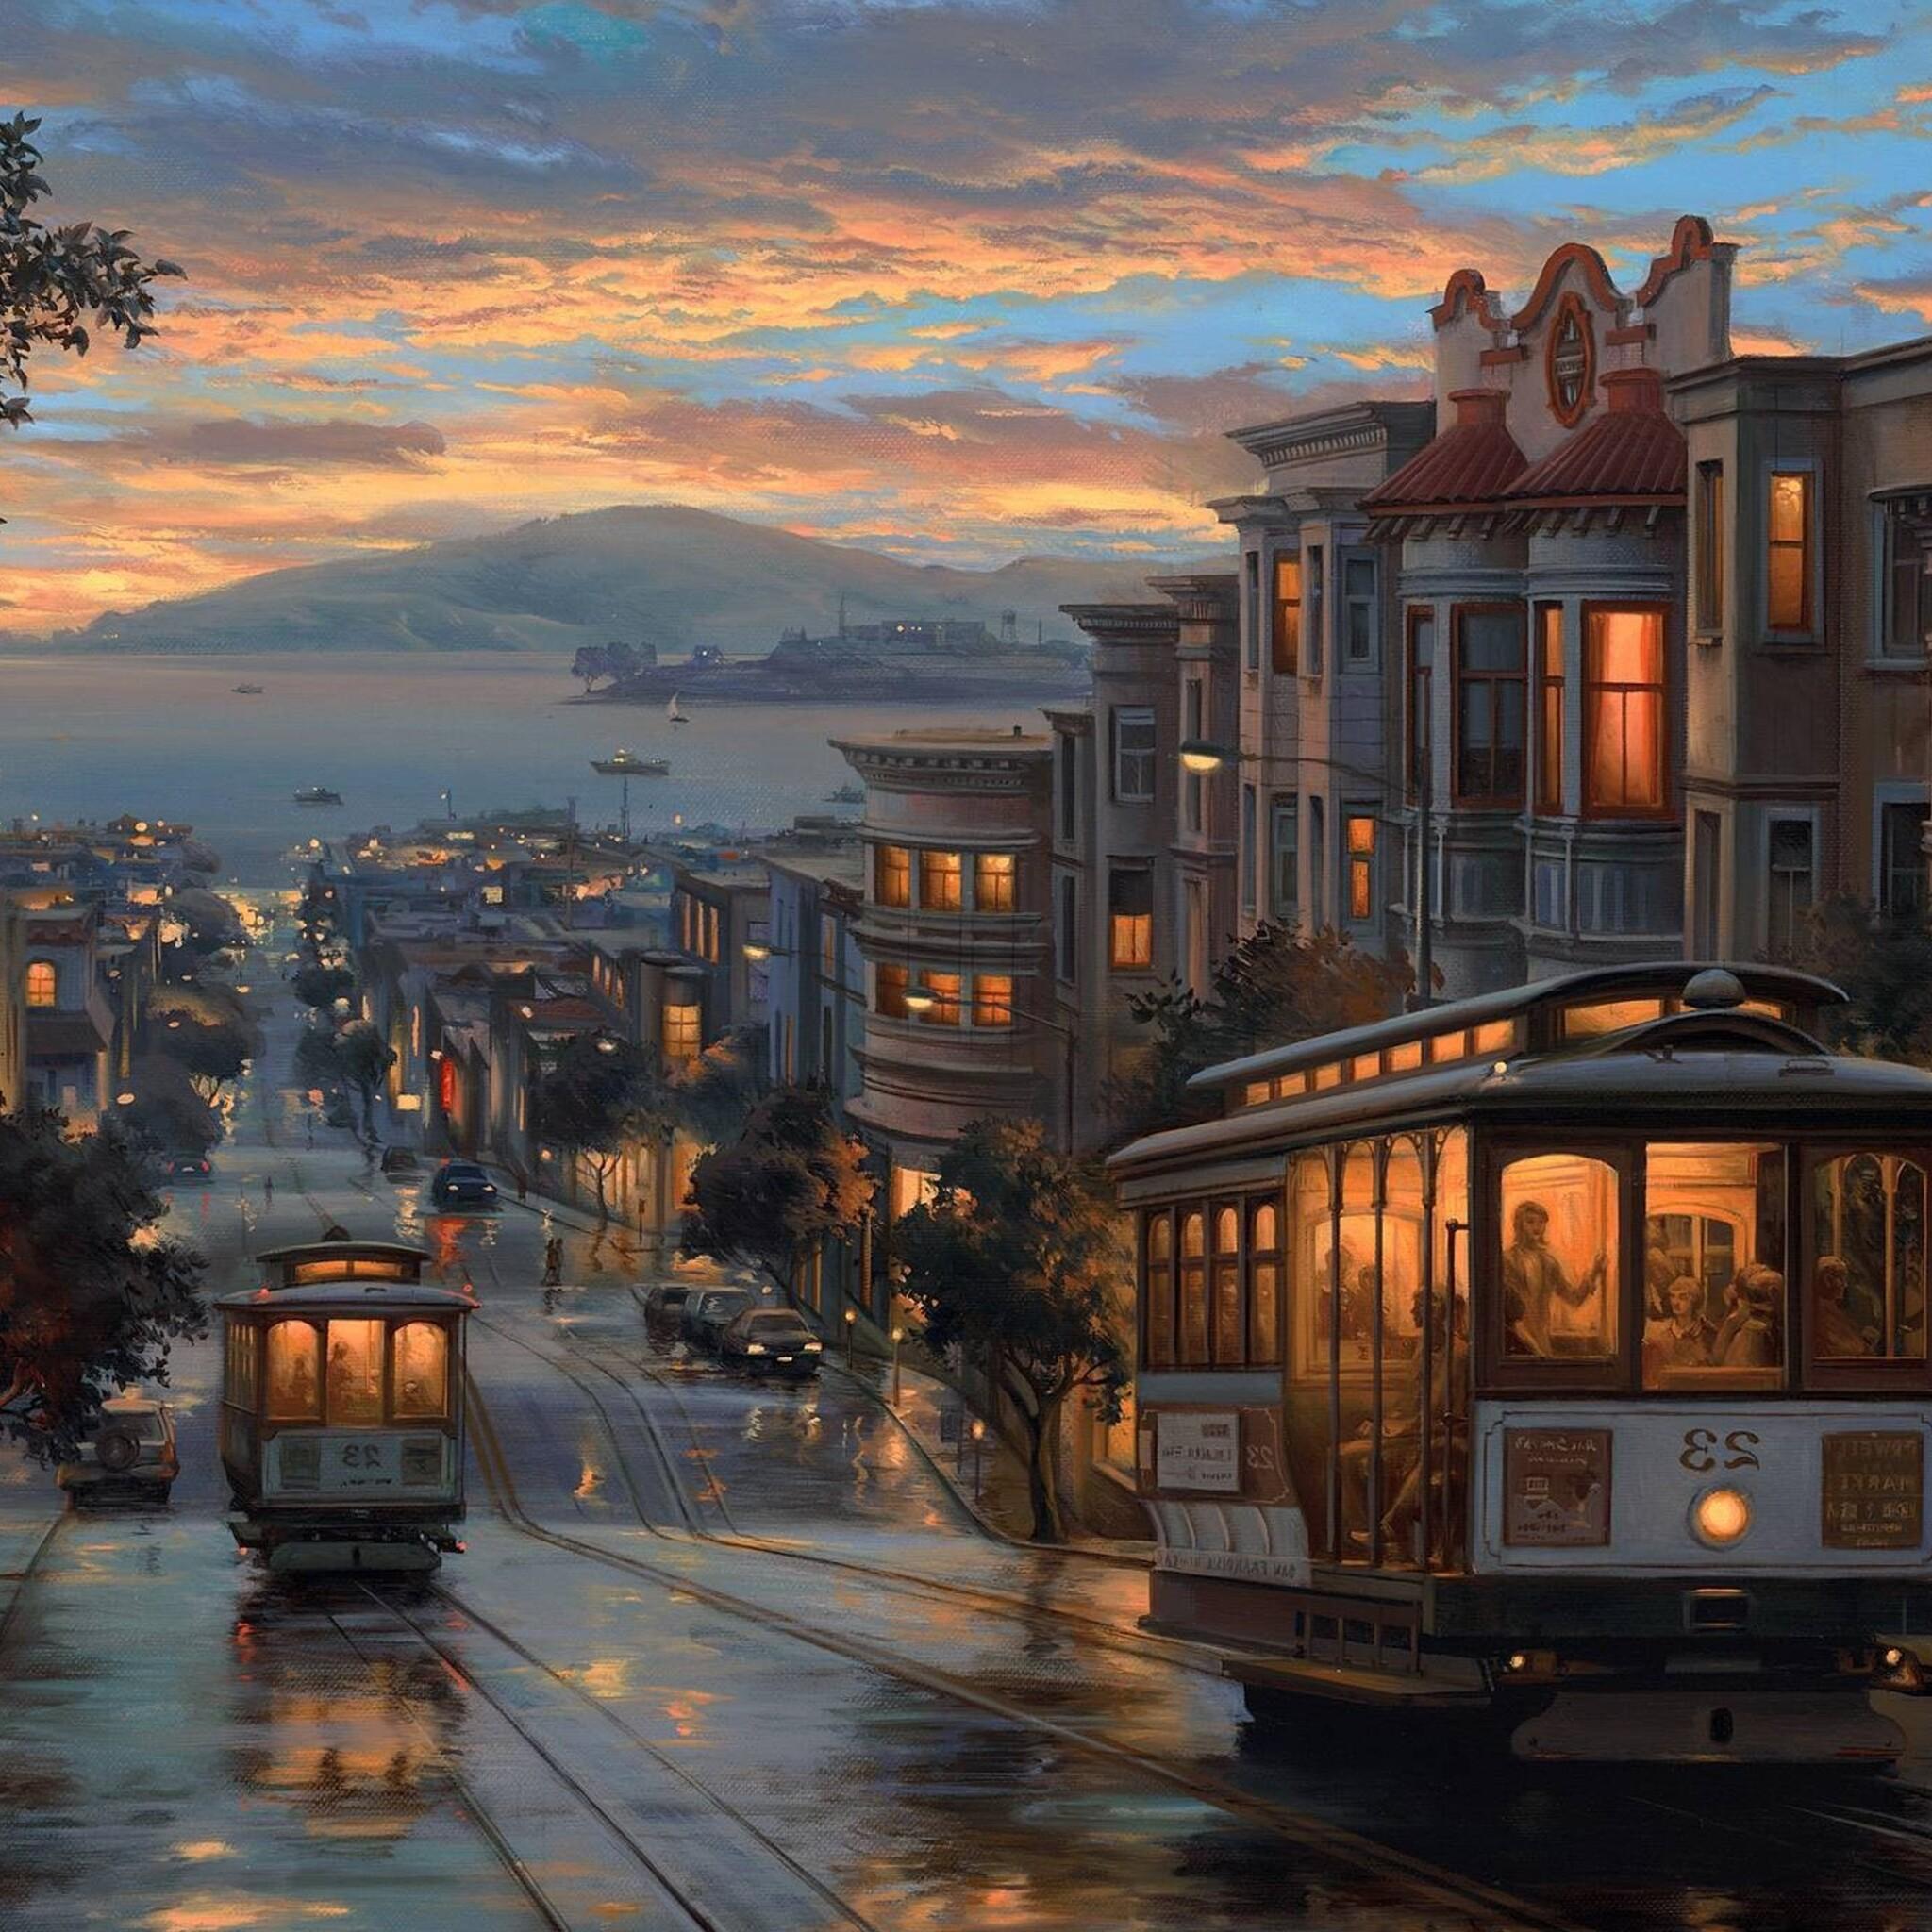 rainy-night-artistic-painting.jpg